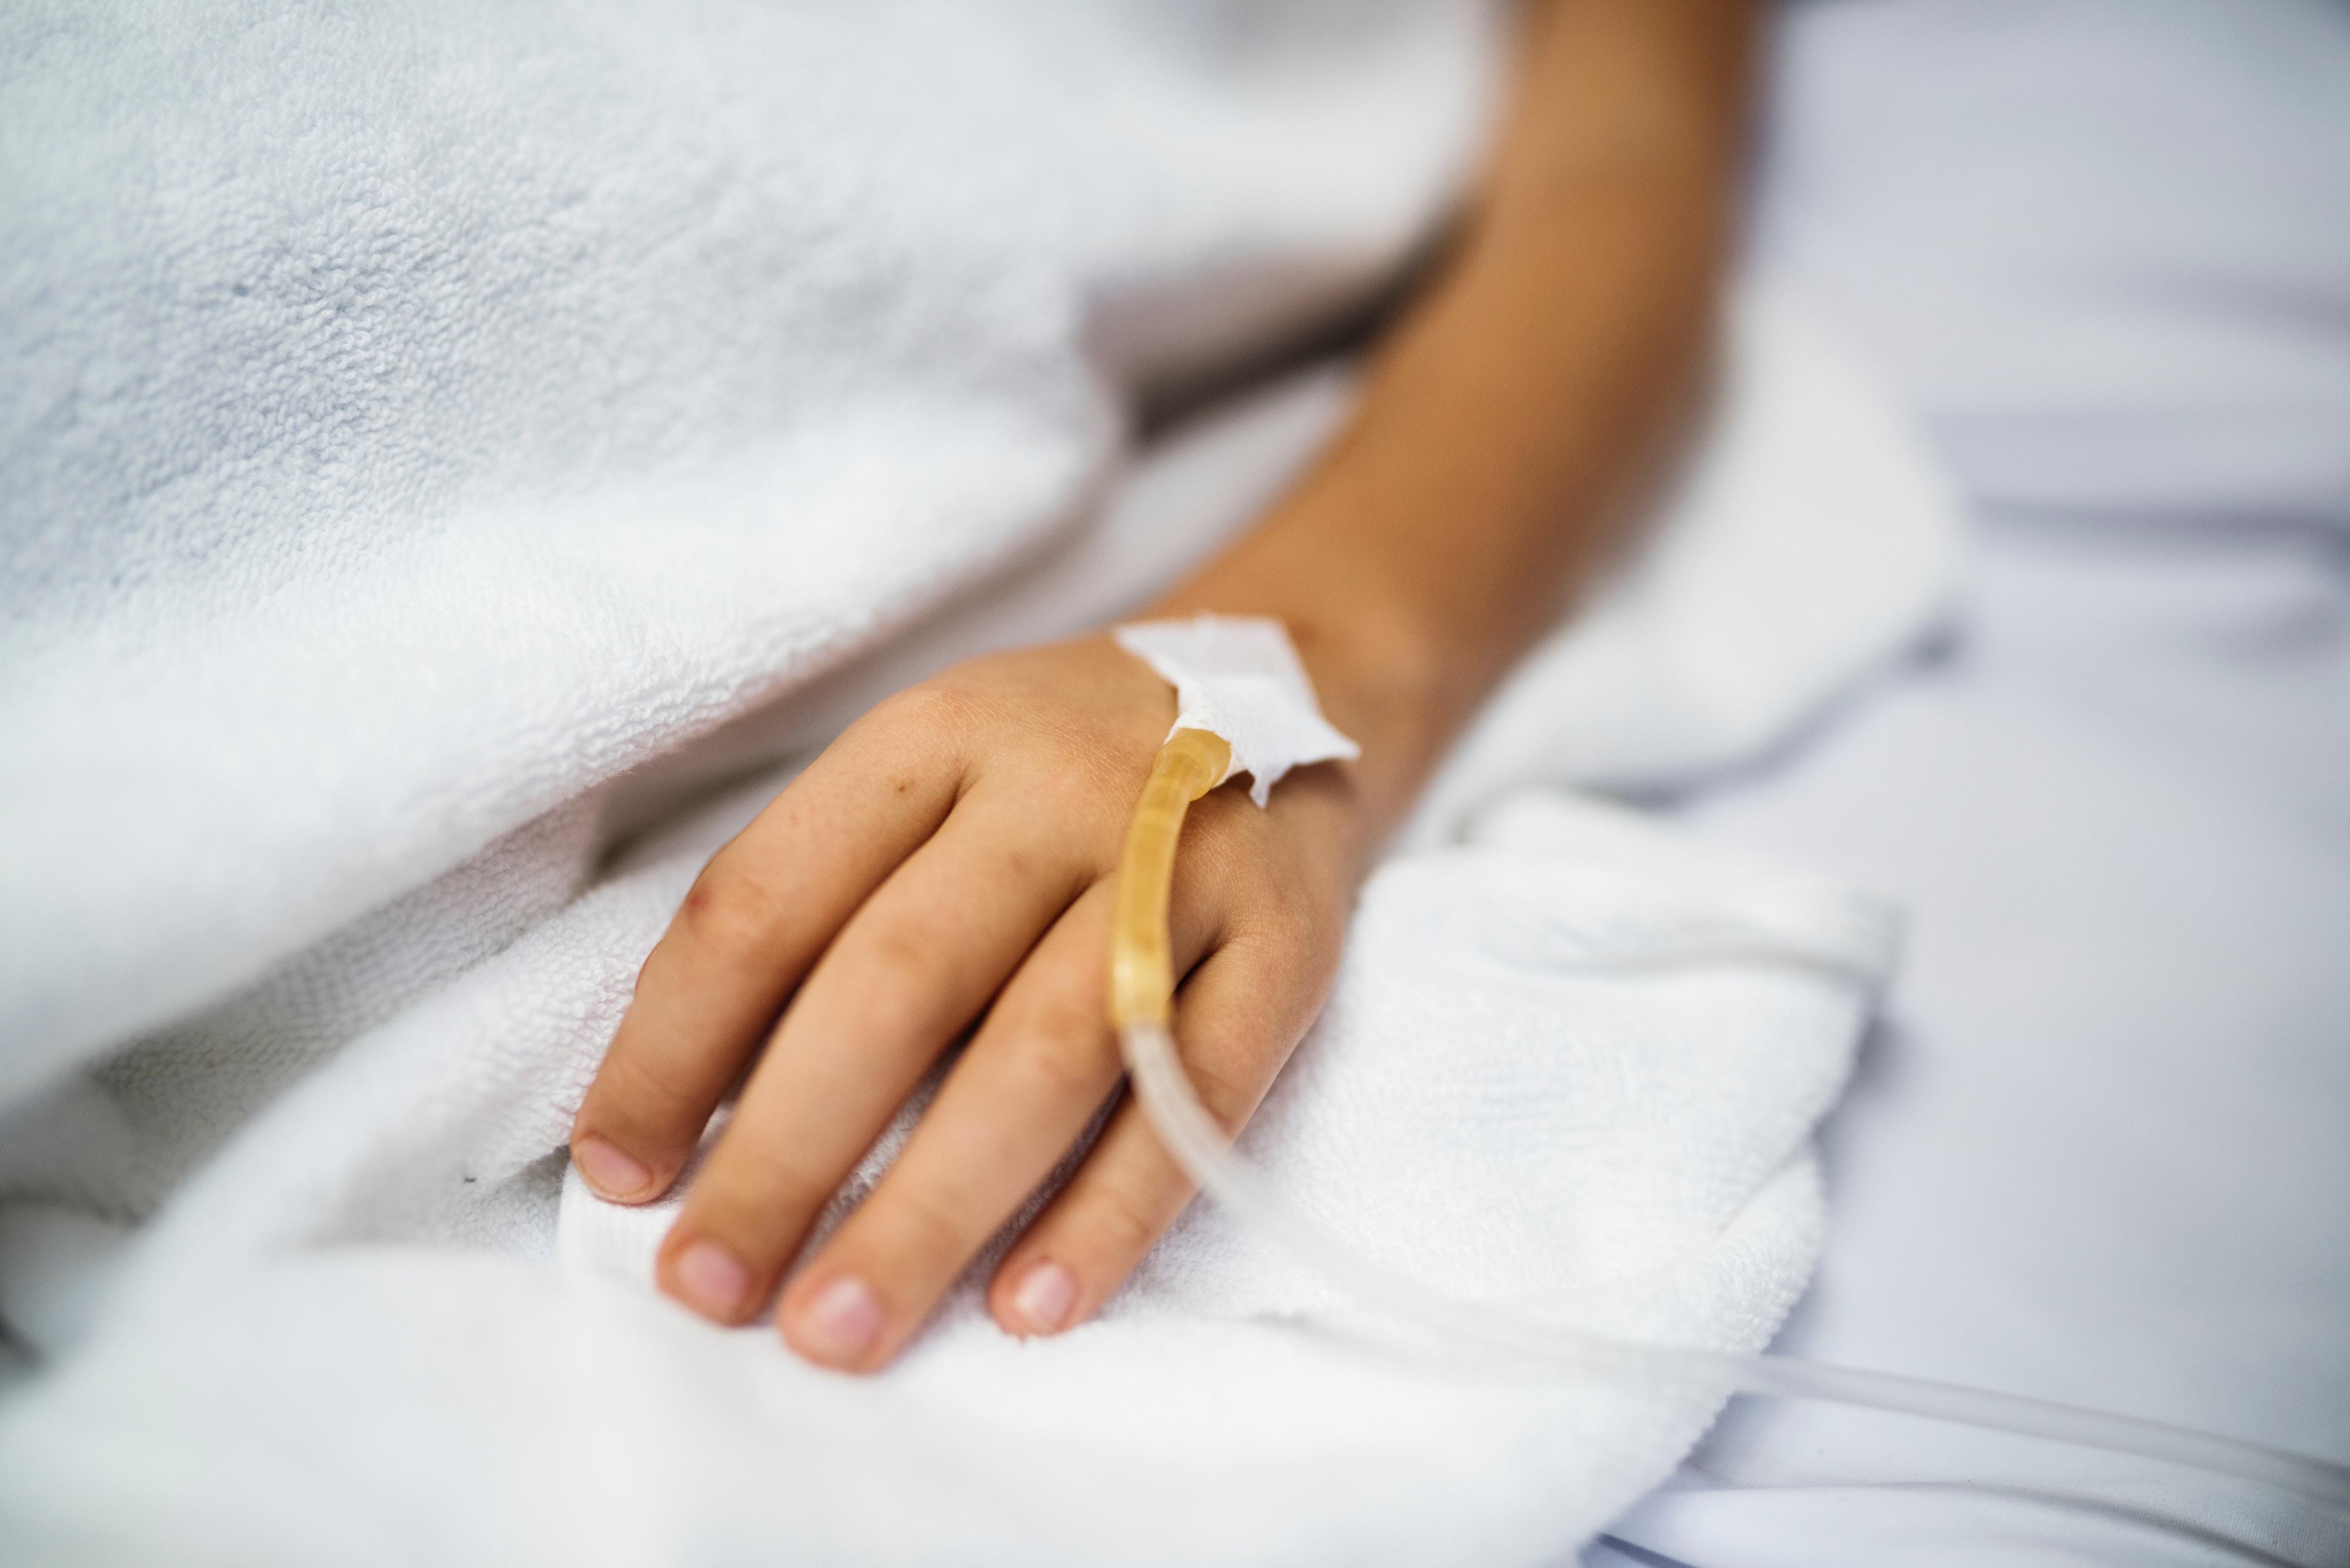 Iv Drip Injecting Human Arm Human Hand